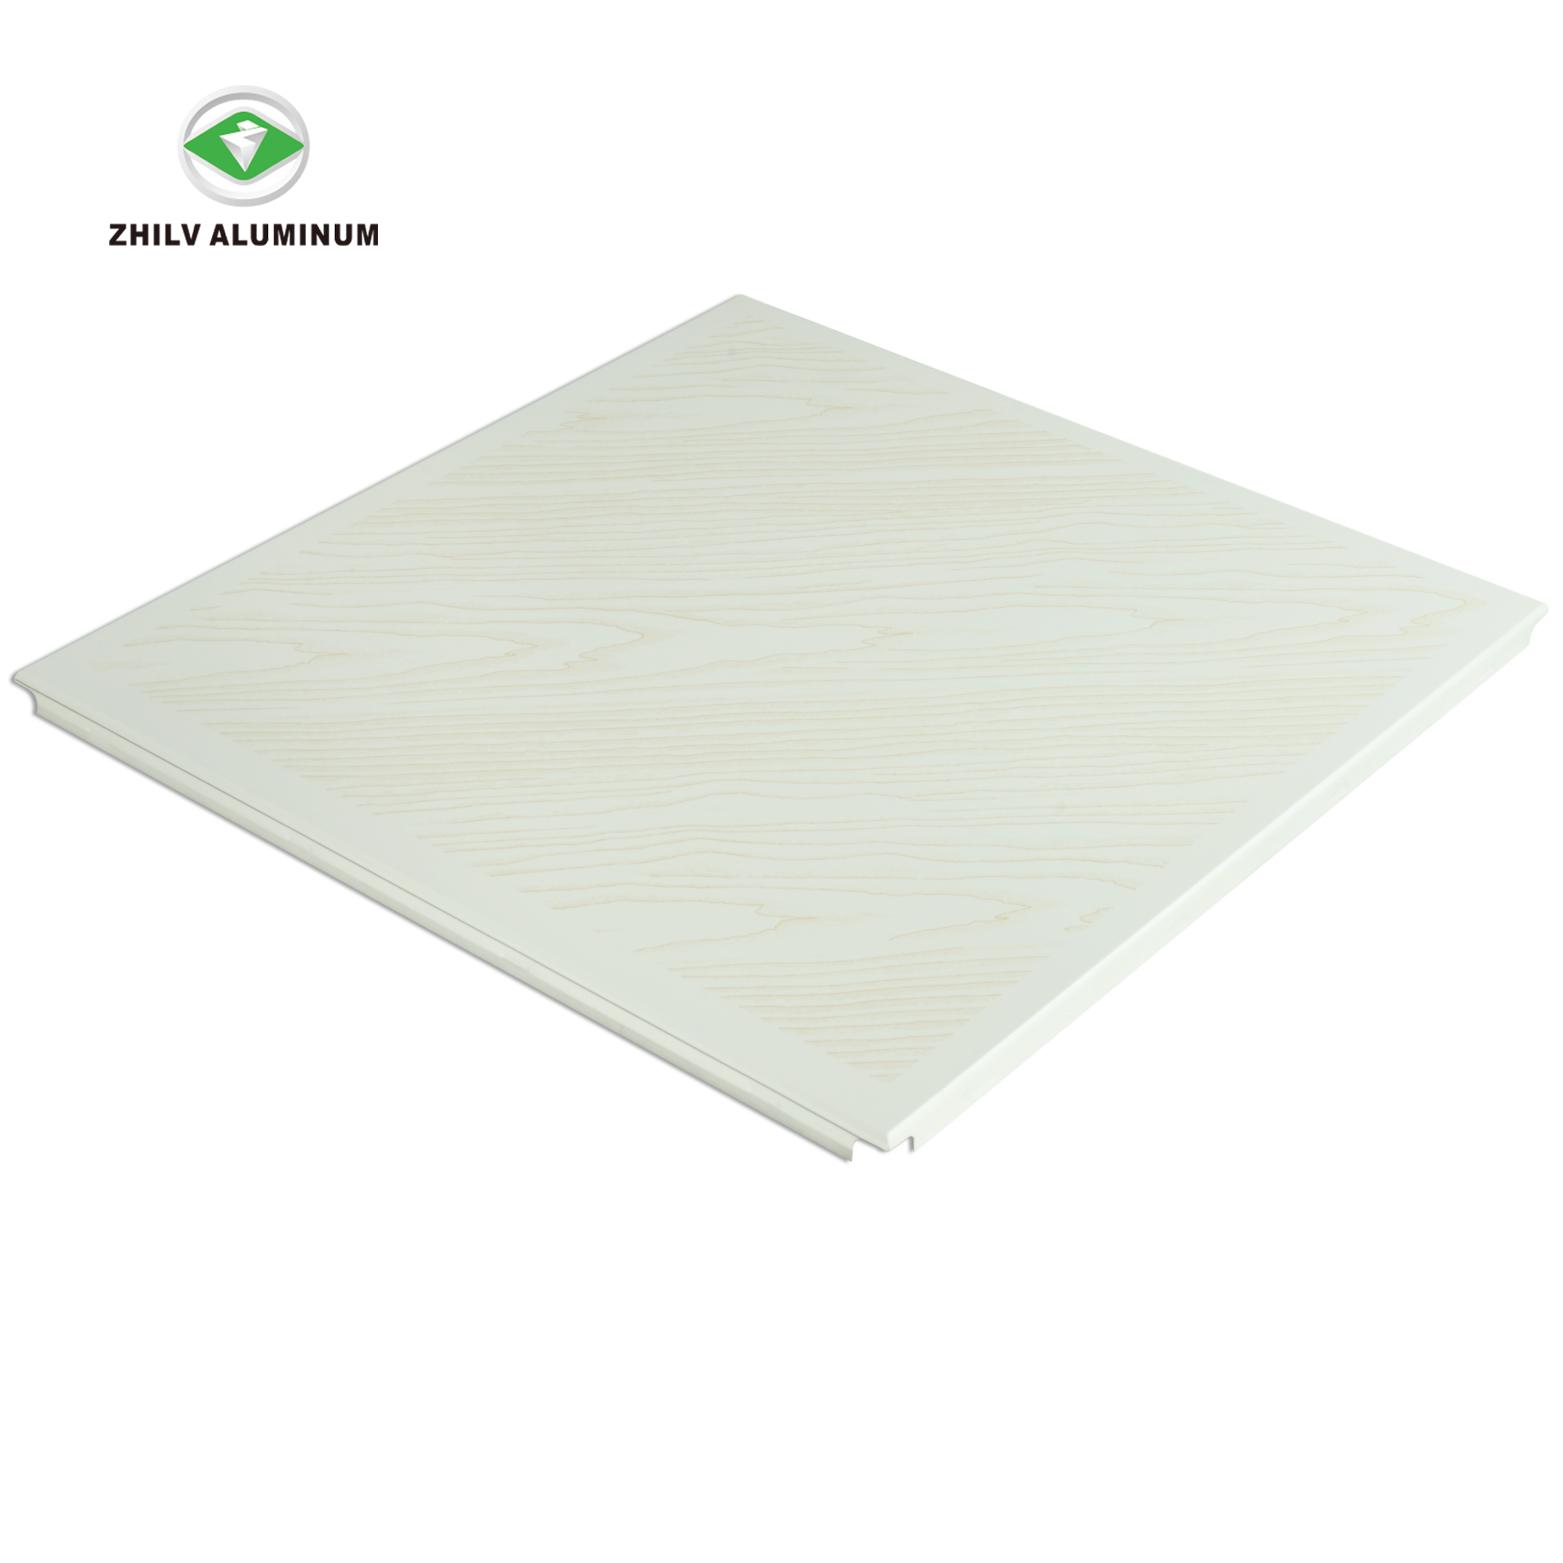 unique rust proof white tin 2x4 styrofoam ceiling tiles buy stratford ceiling tiles 12x12 glue up ceiling tiles white tin ceiling tiles product on